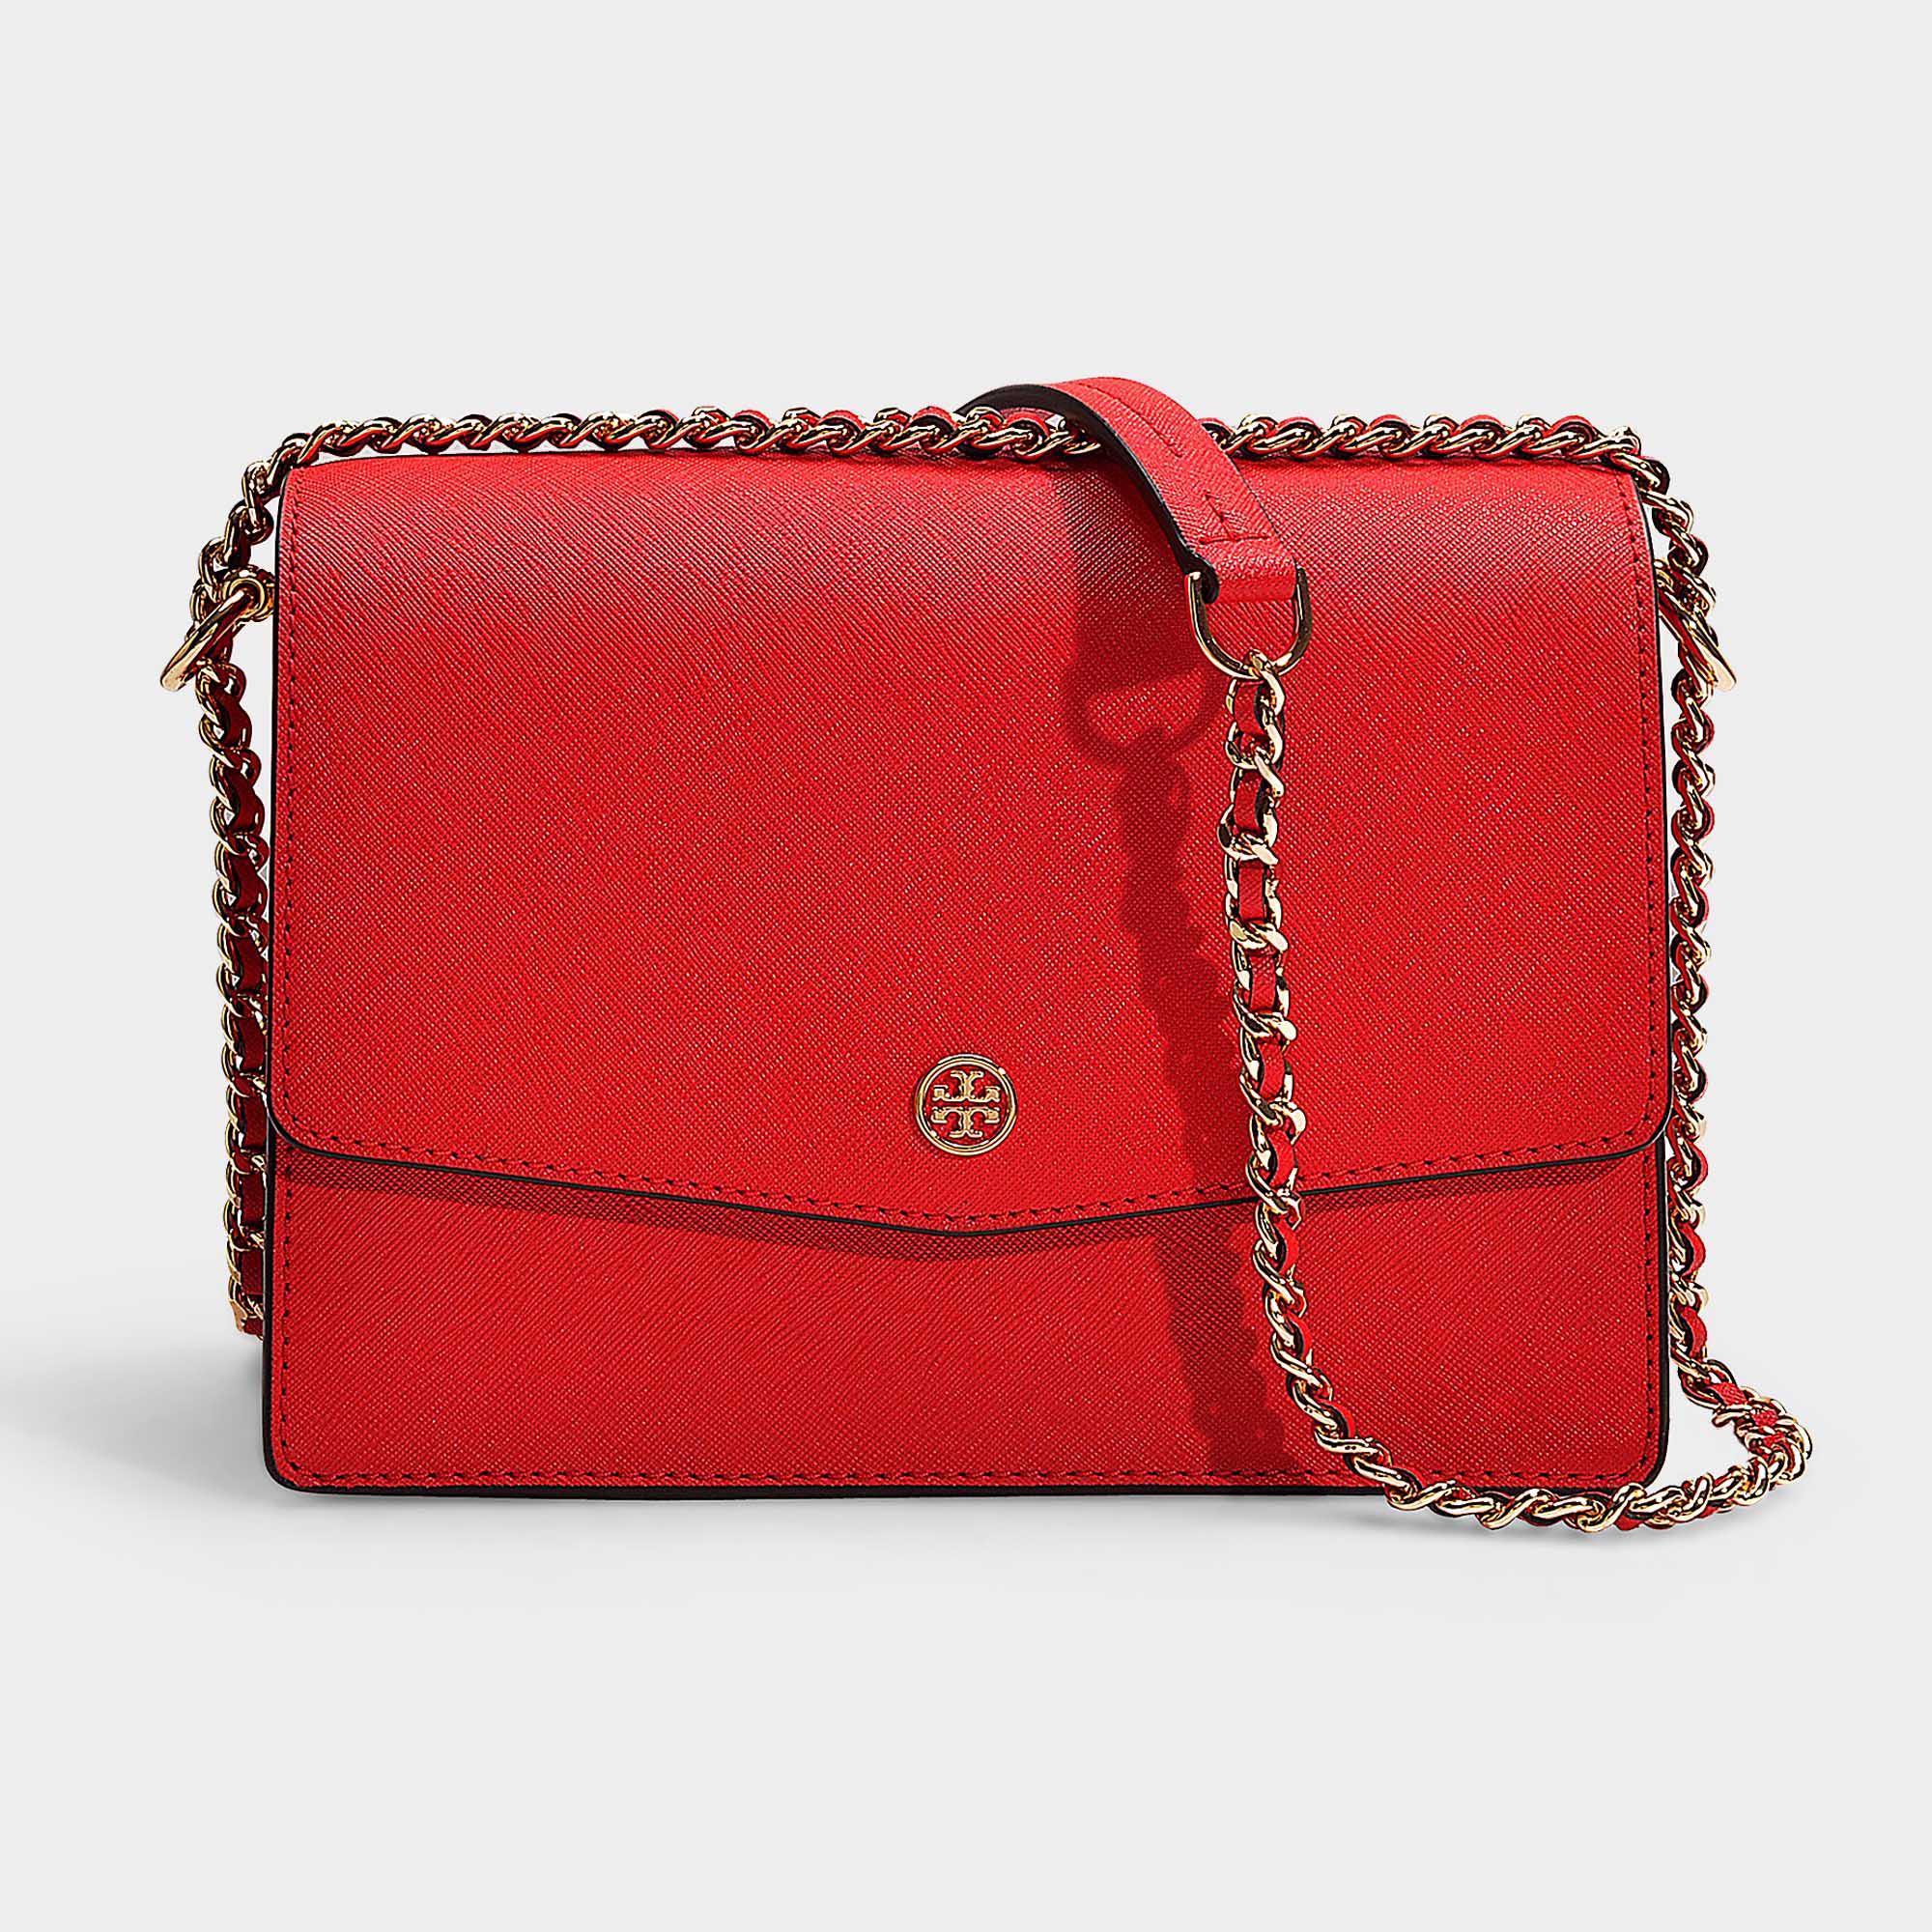 51cdfa960c01 Tory Burch. Women s Robinson Convertible Shoulder Bag In Brilliant Red  Calfskin